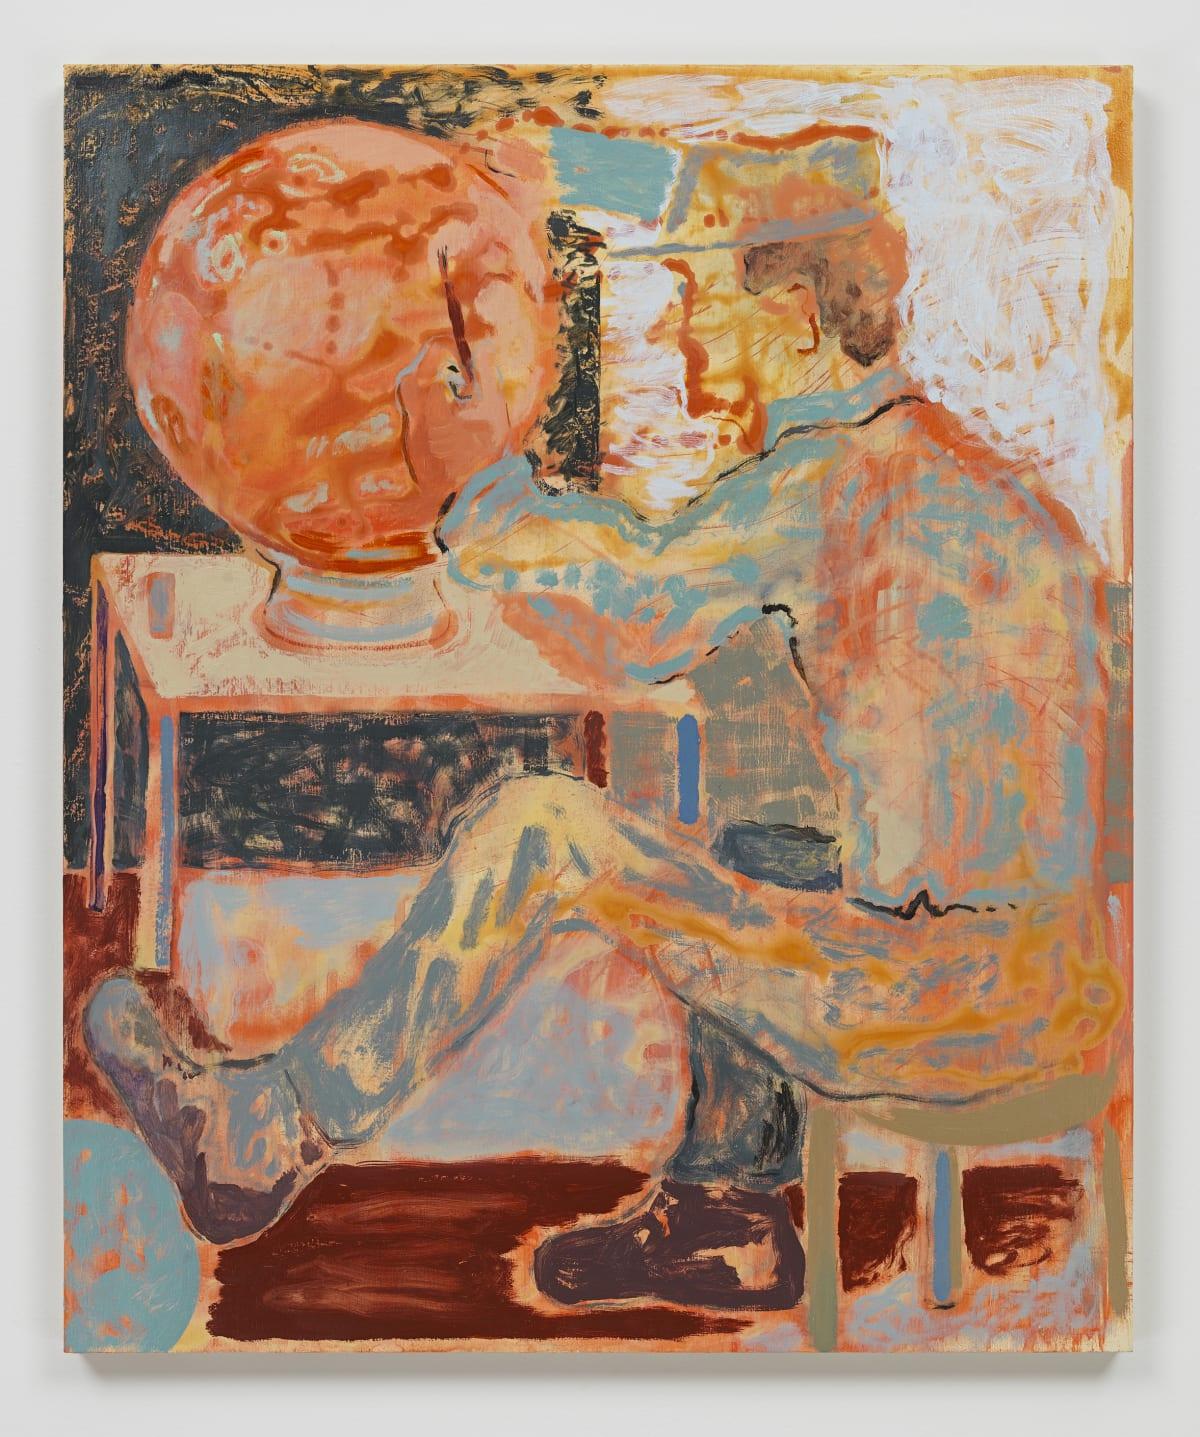 Sam Bornstein, Globe Painter, 2019